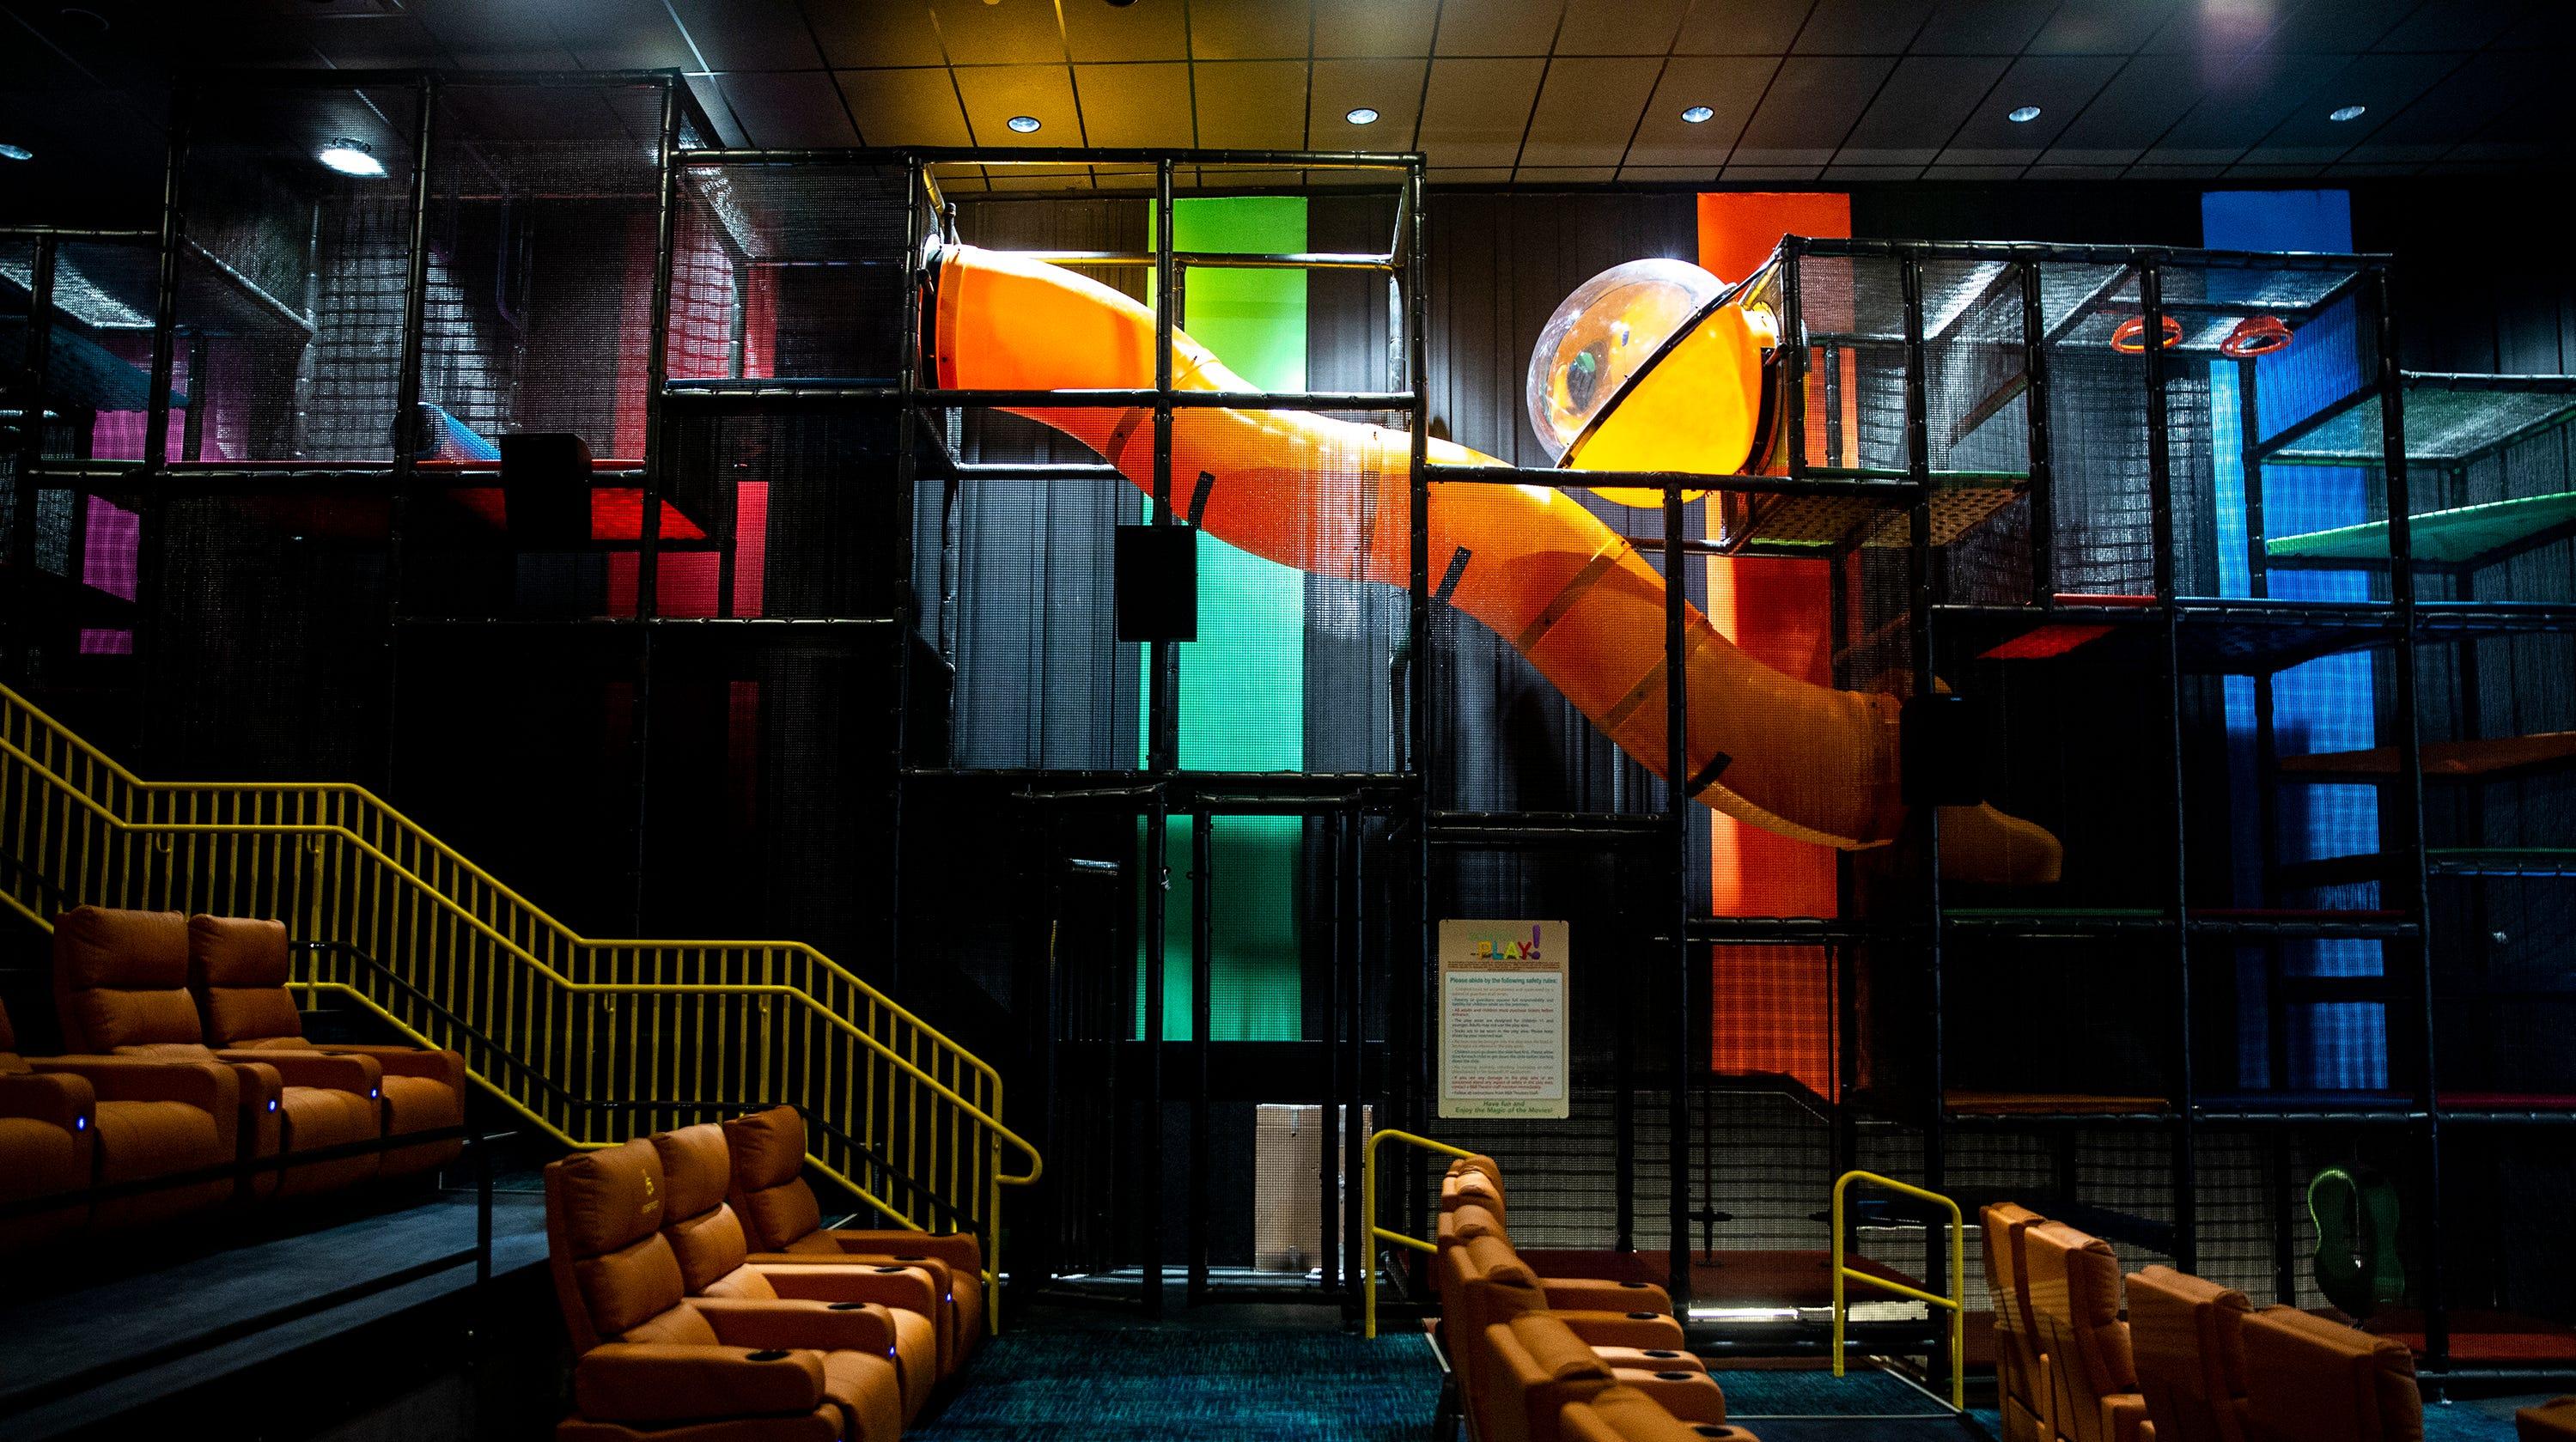 Sneak peek: Ankeny's movie theater, bowling alley opens Thursday